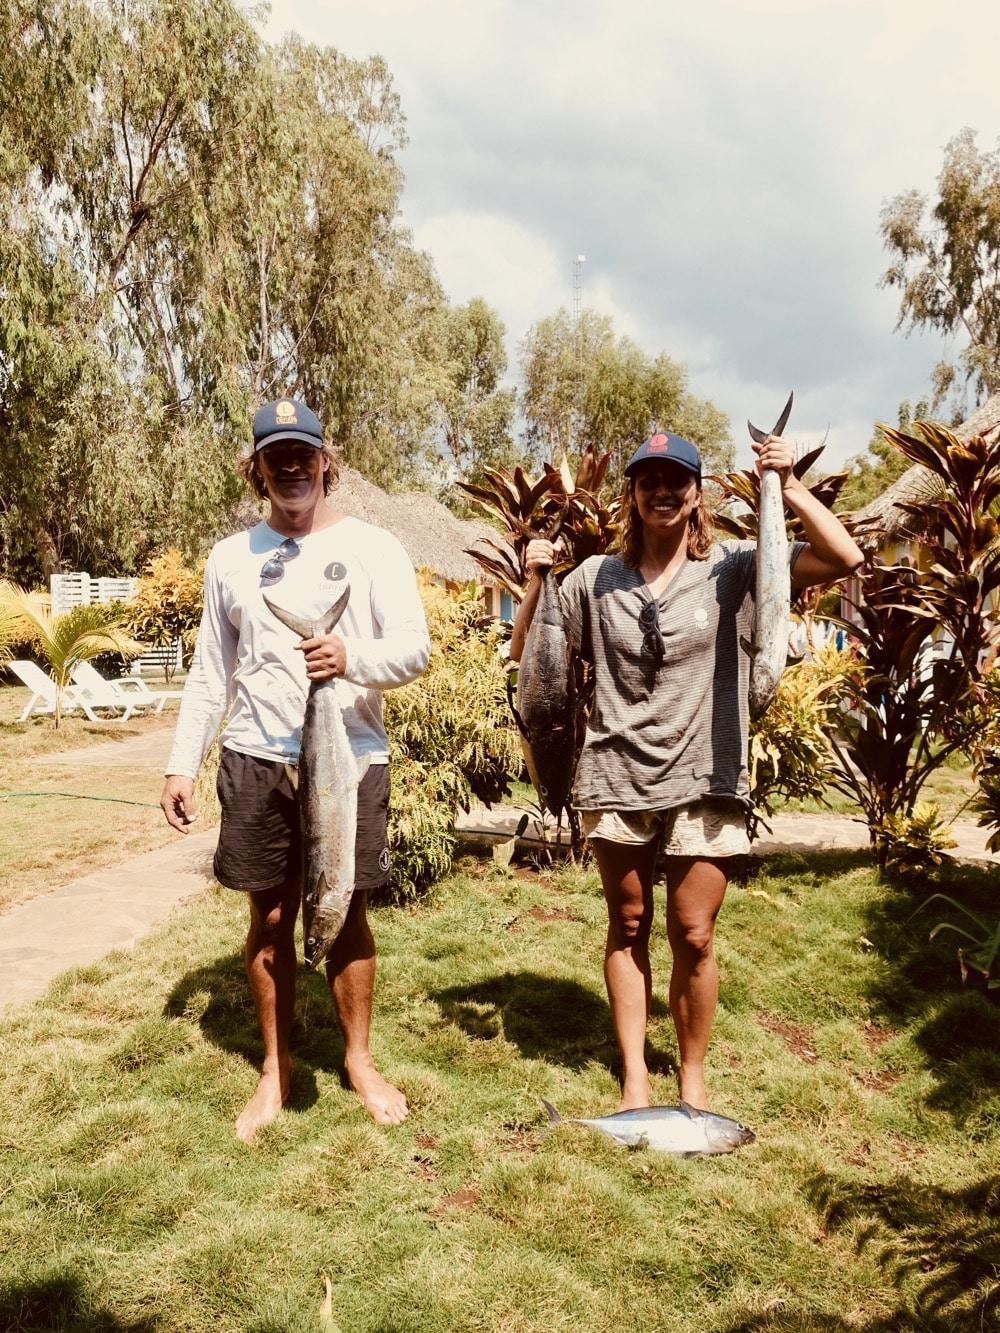 Pêche au Nicaragua - Chipiron surf trip